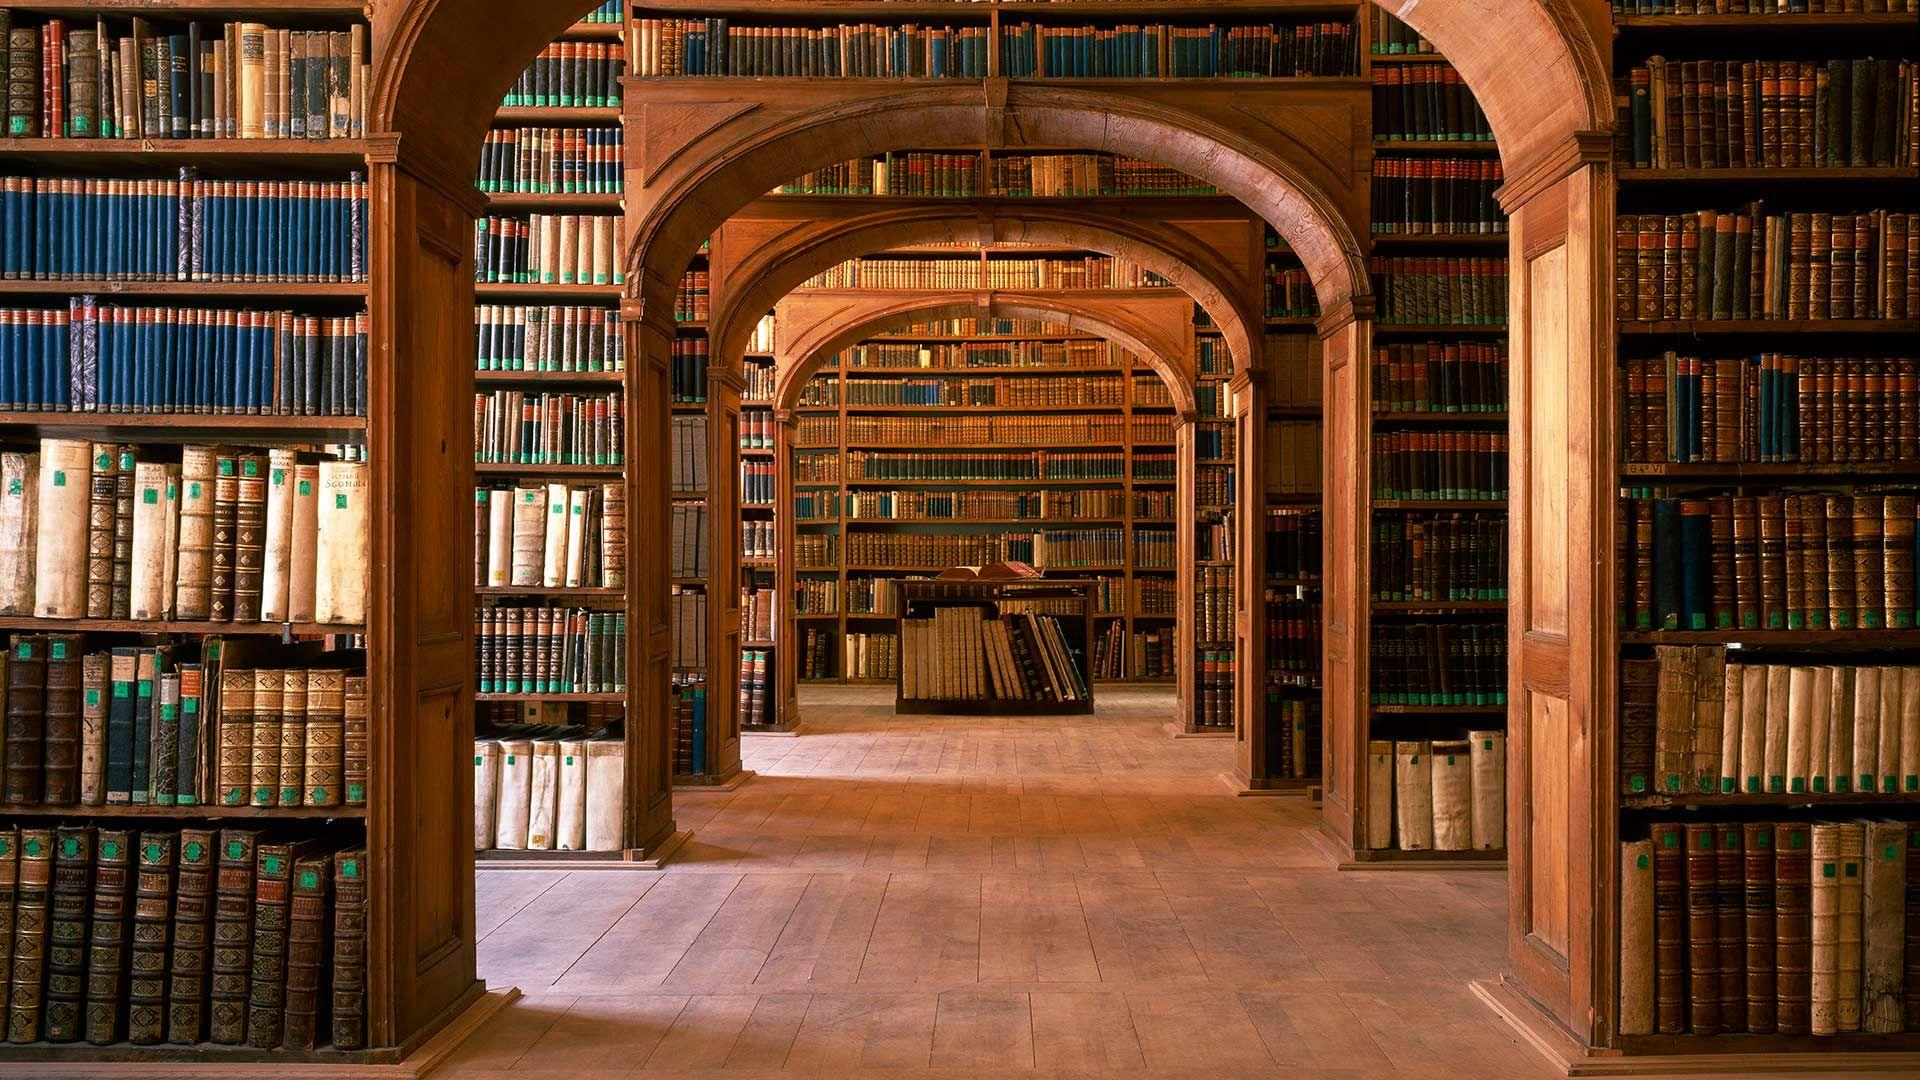 Hd Library Wallpaper Beautiful Library City Lights